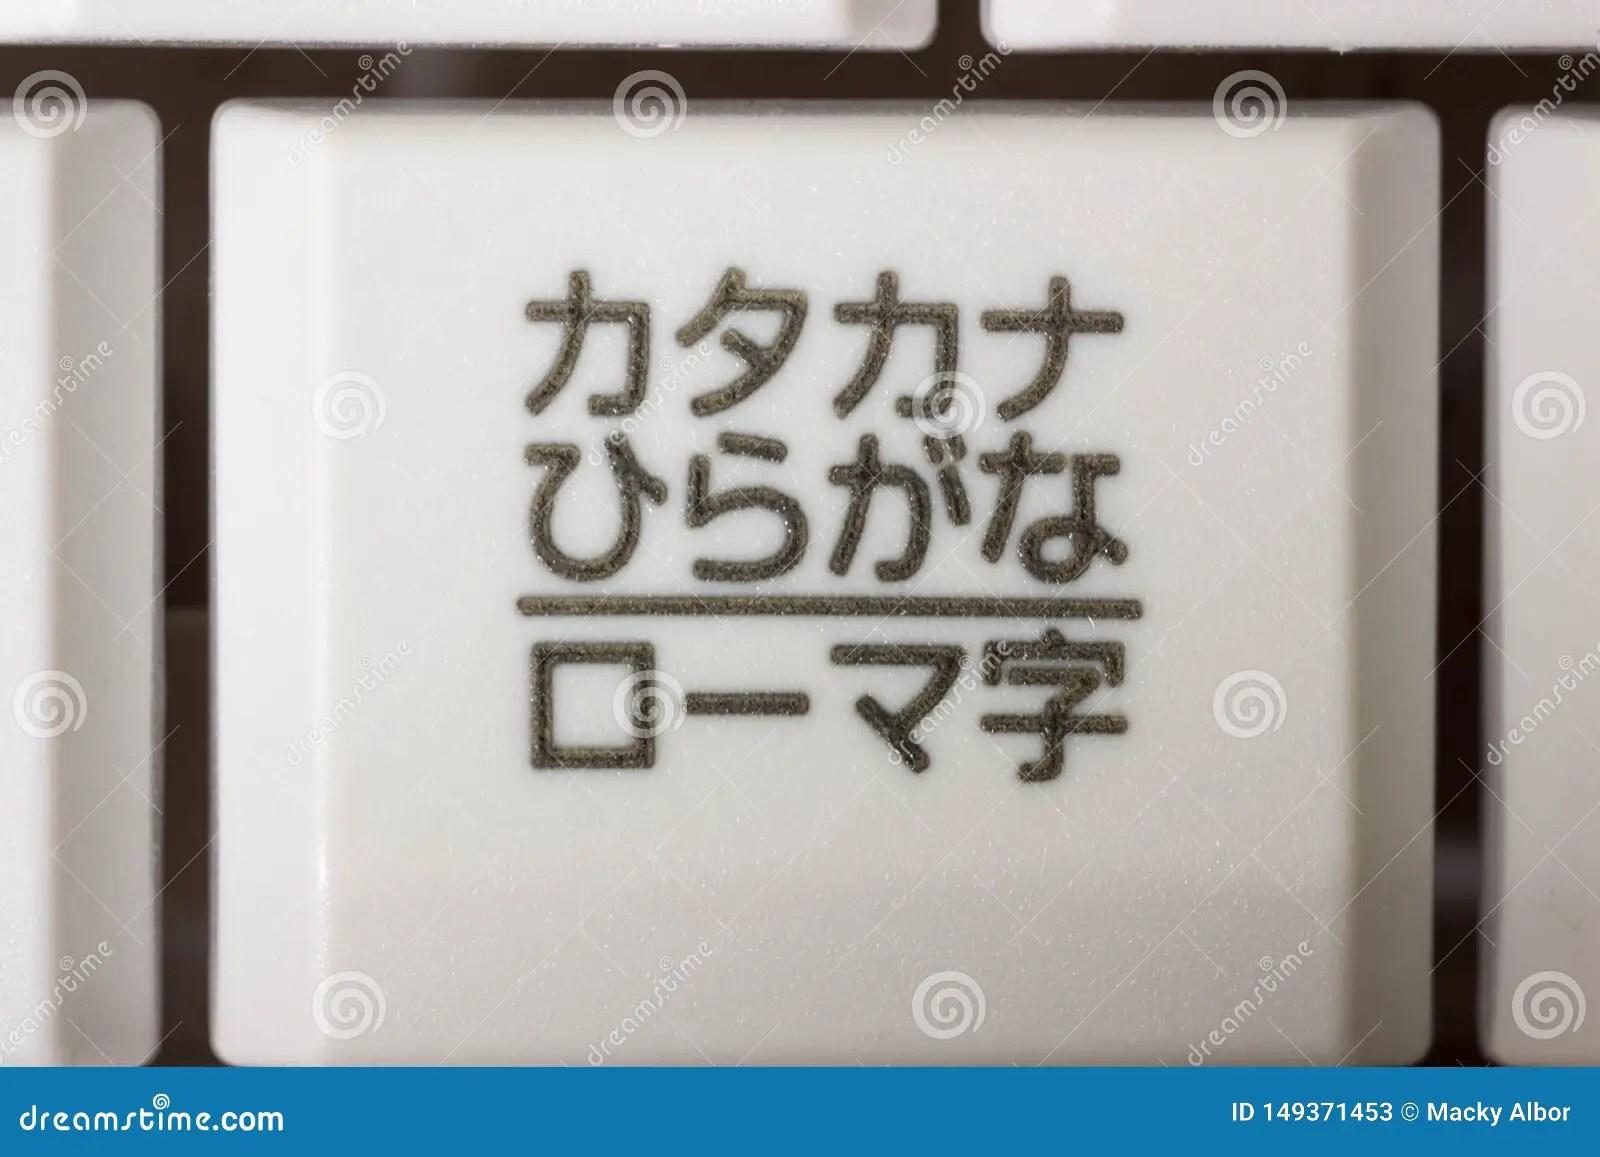 A Japanese Pc Keyboard Key Button Which Says Katakana